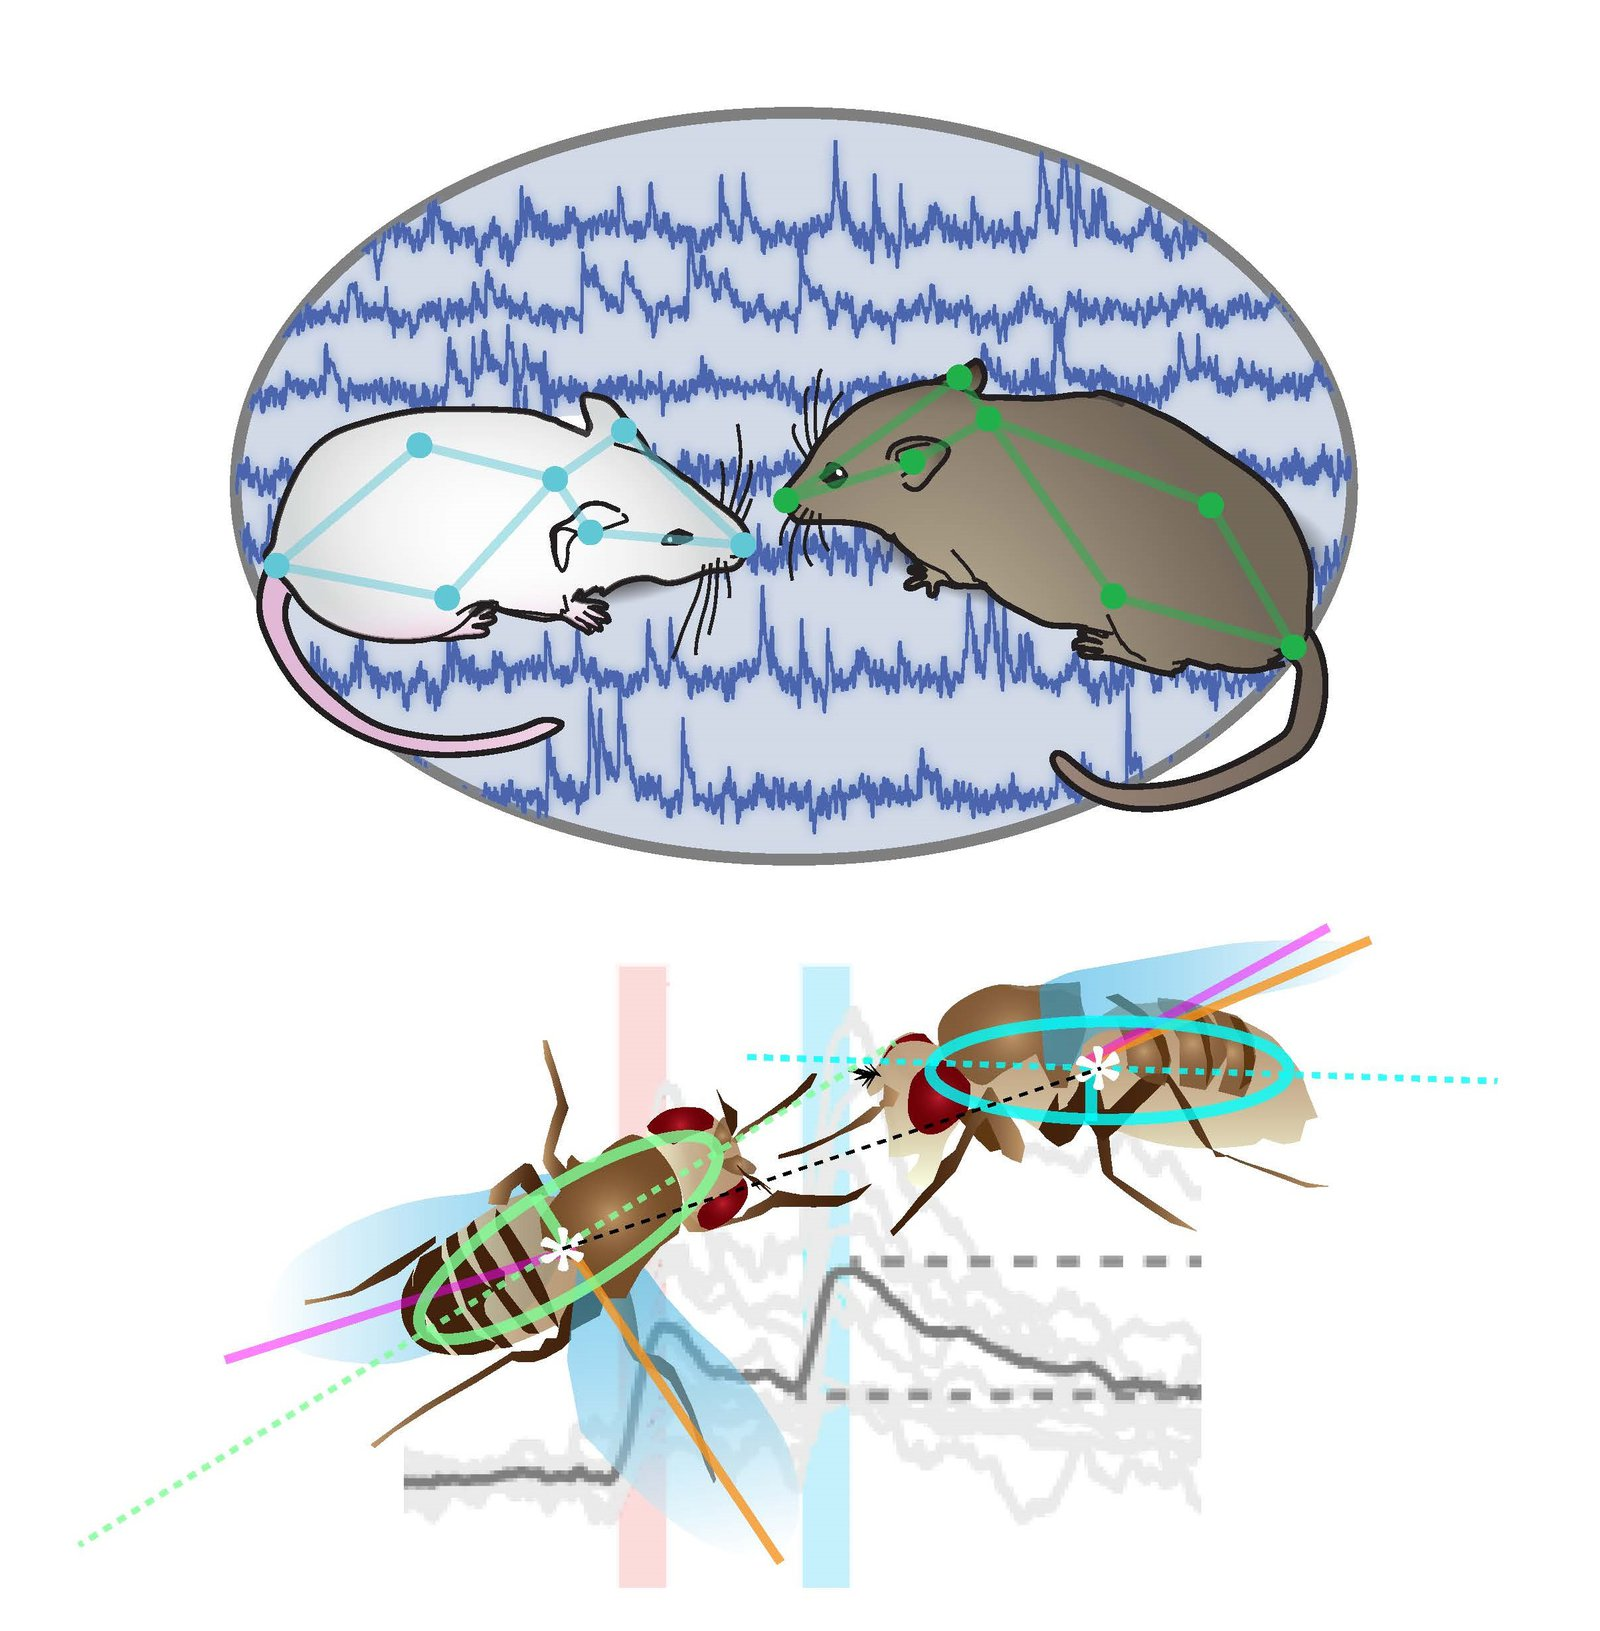 Mice and Flies as Behavior Models